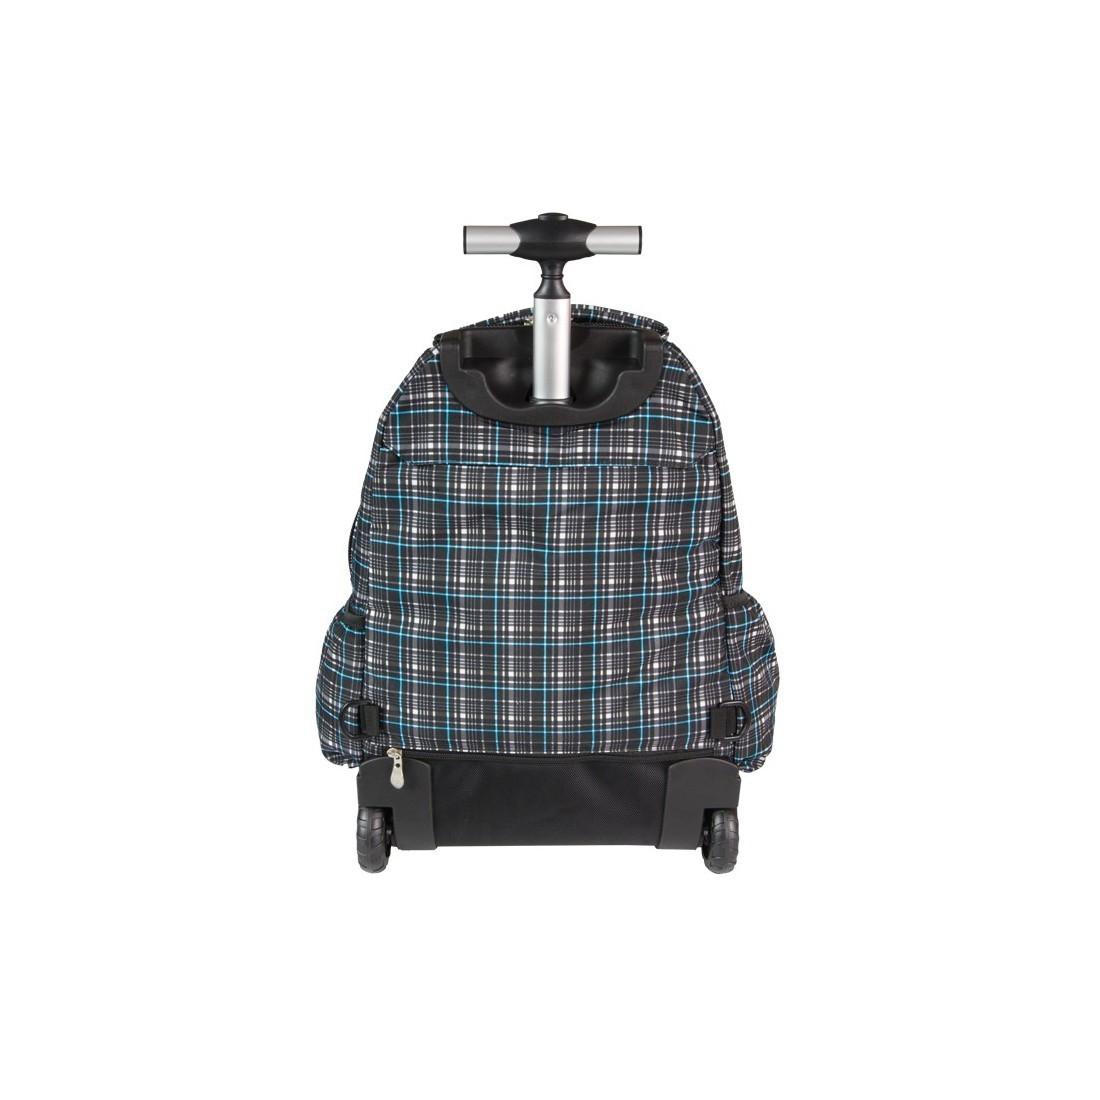 Plecak CoolPack na kółkach dla chłopca w kratkę - JUNIOR GREY SHADOW CP 191 - plecak-tornister.pl